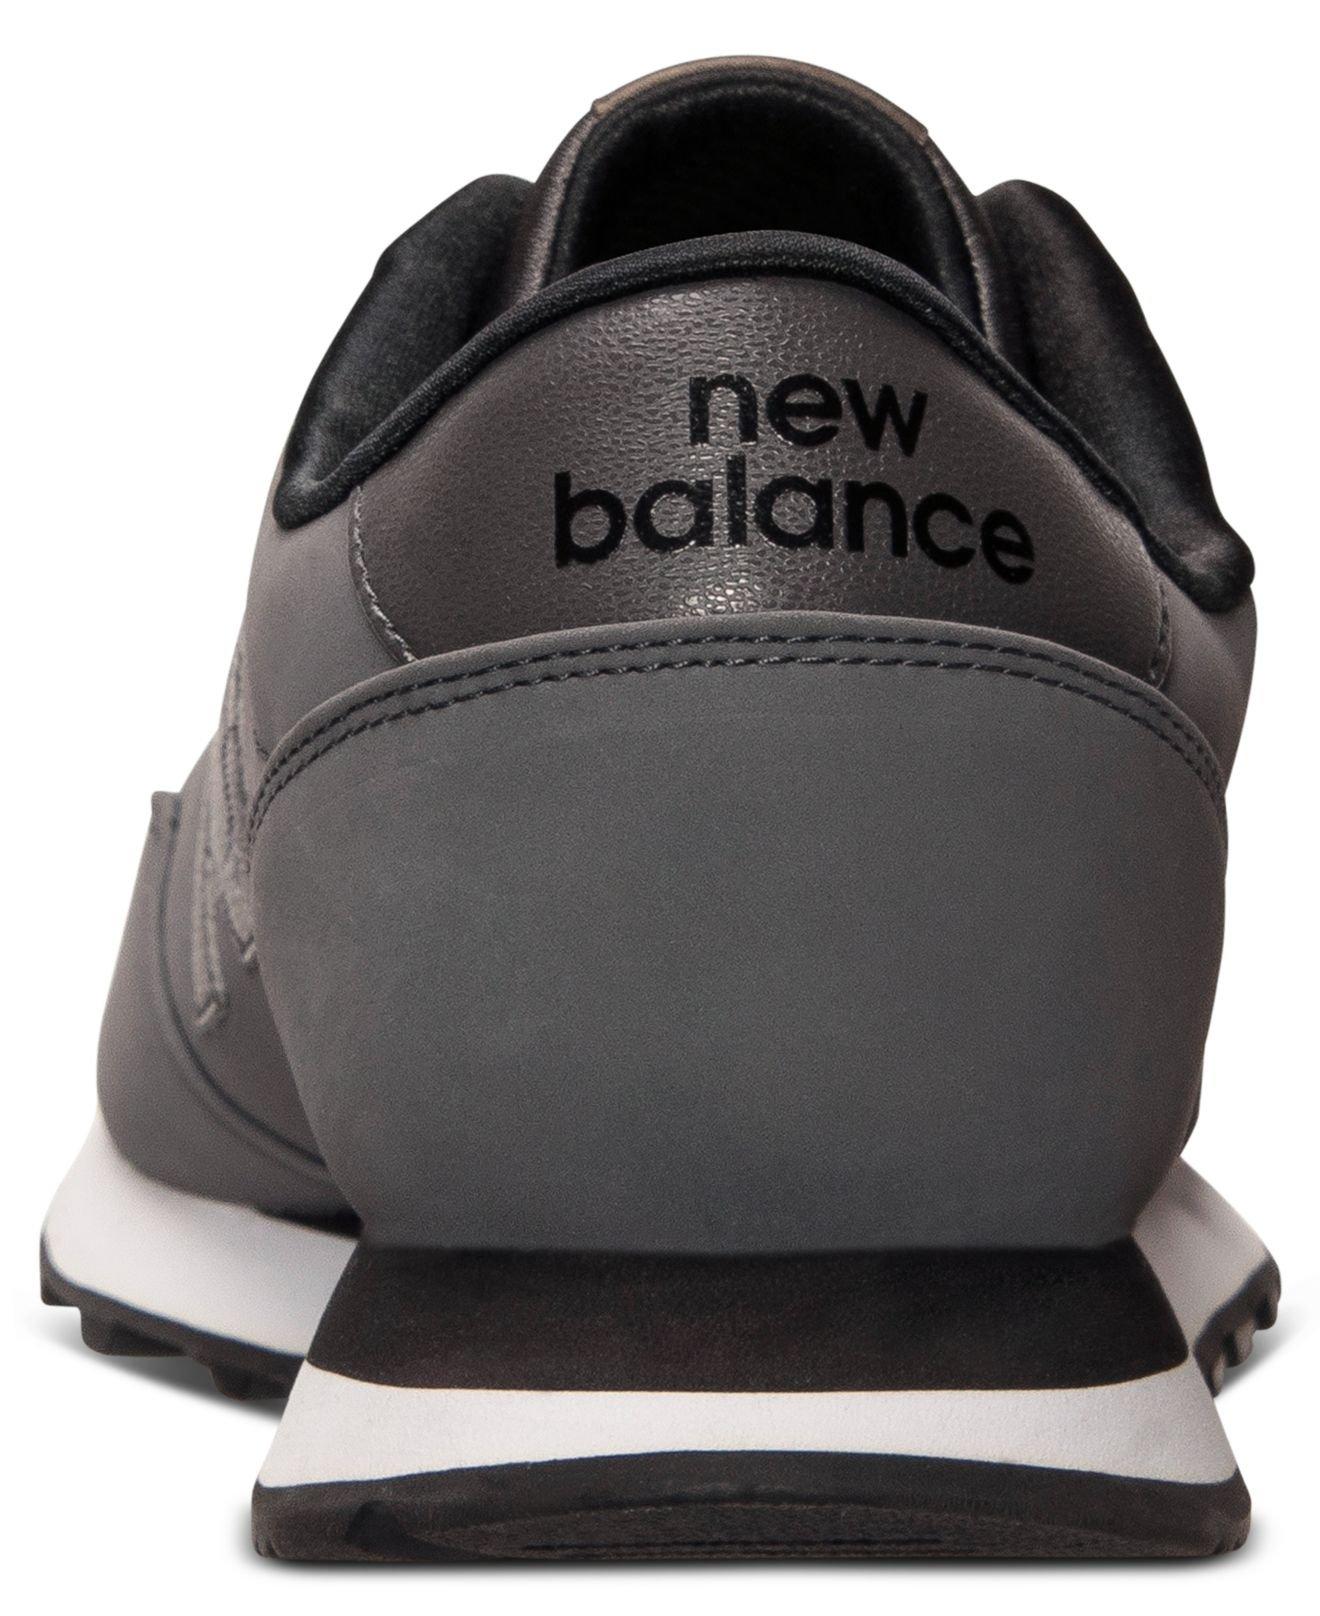 new balance 410 mens casual